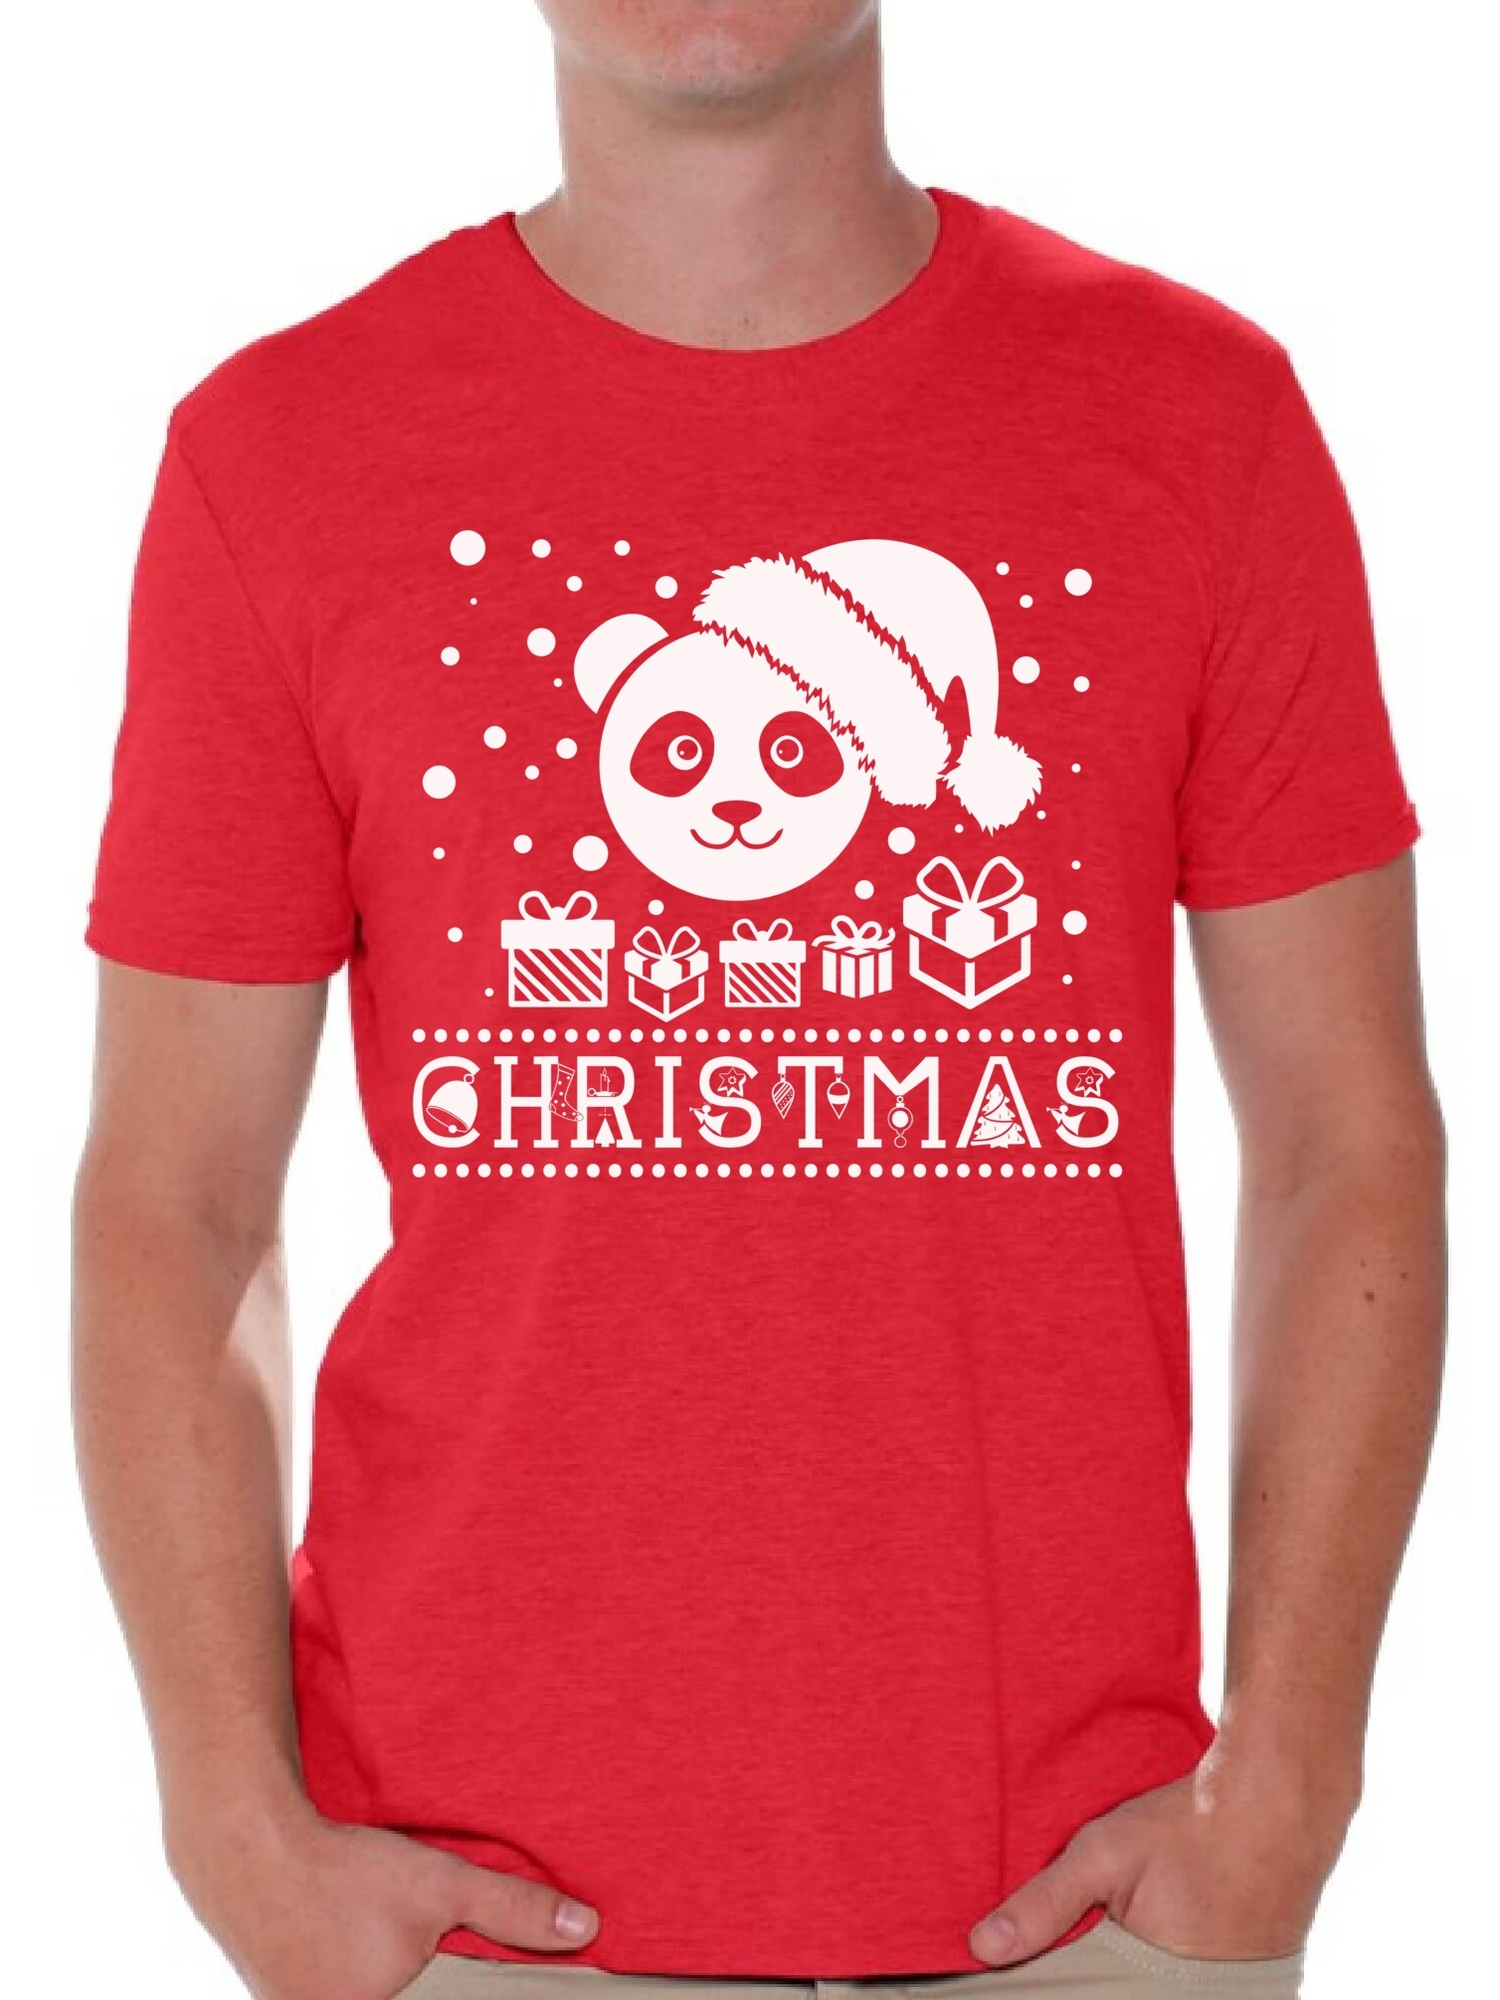 Christmas Mens Kids T Shirt Skull Santa Hat Xmas Gift Novelty Festive T-Shirt